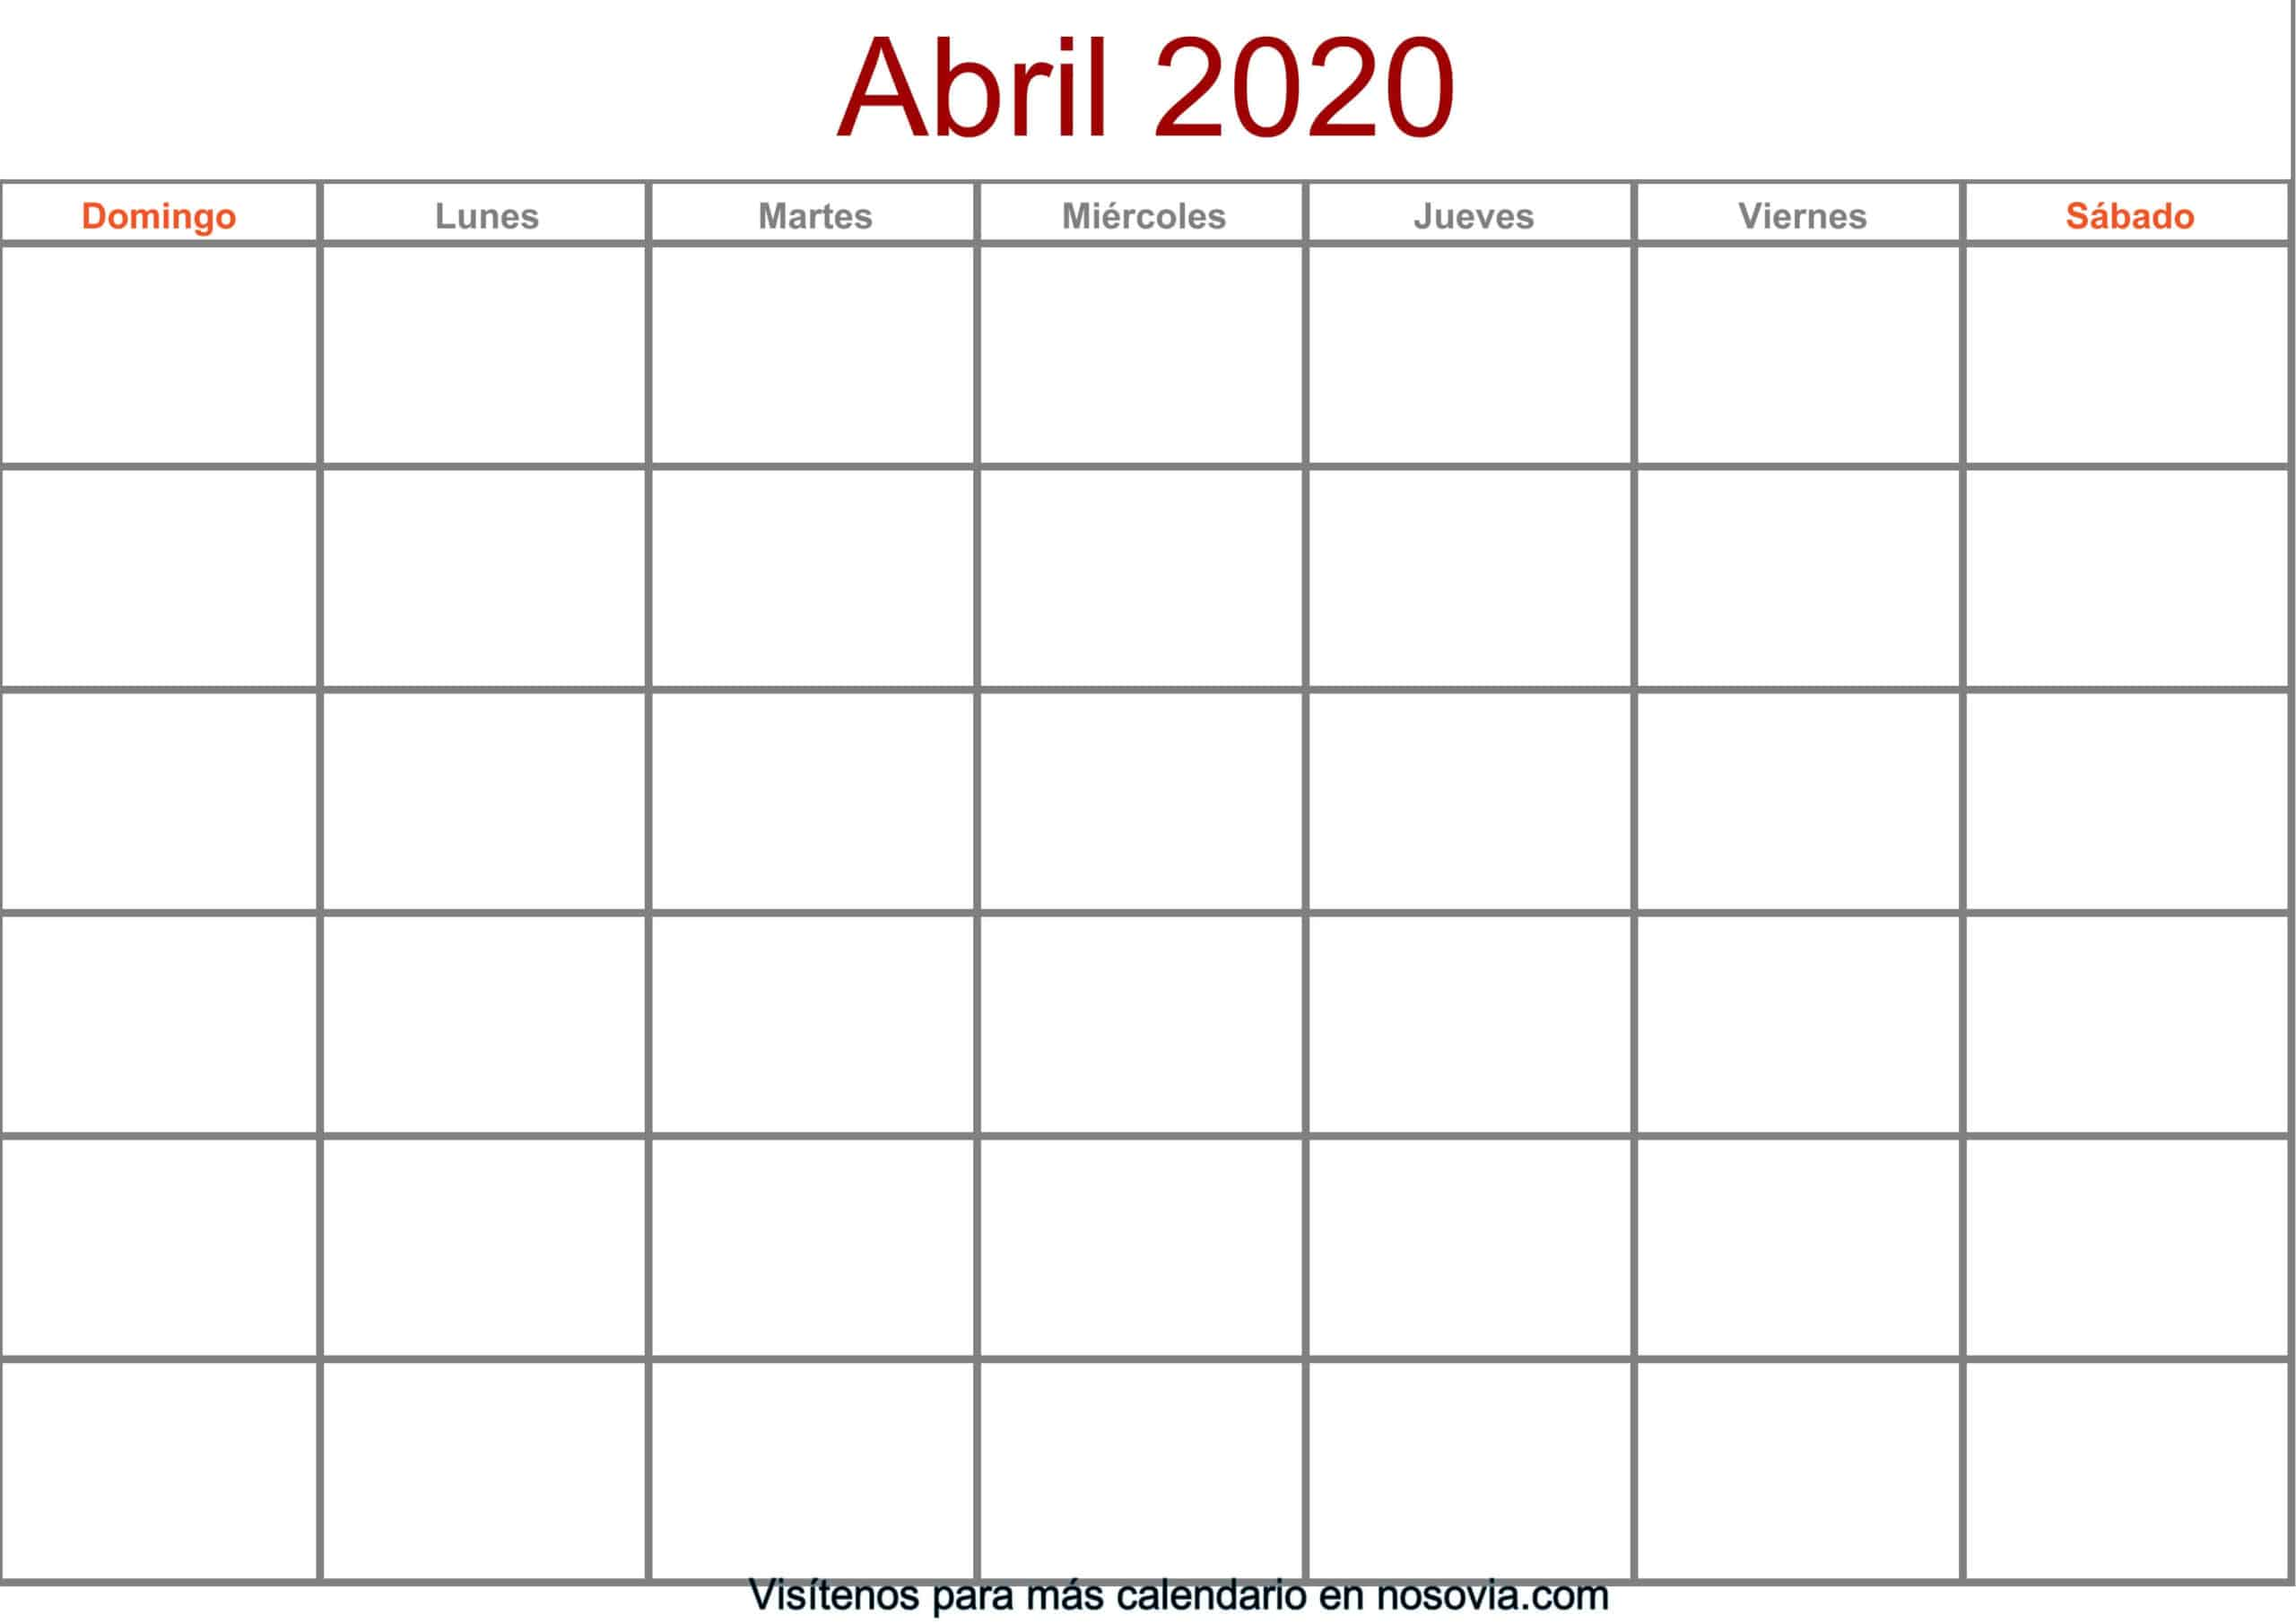 Calendario-abril-2020-en-blanco-Formato-gratis